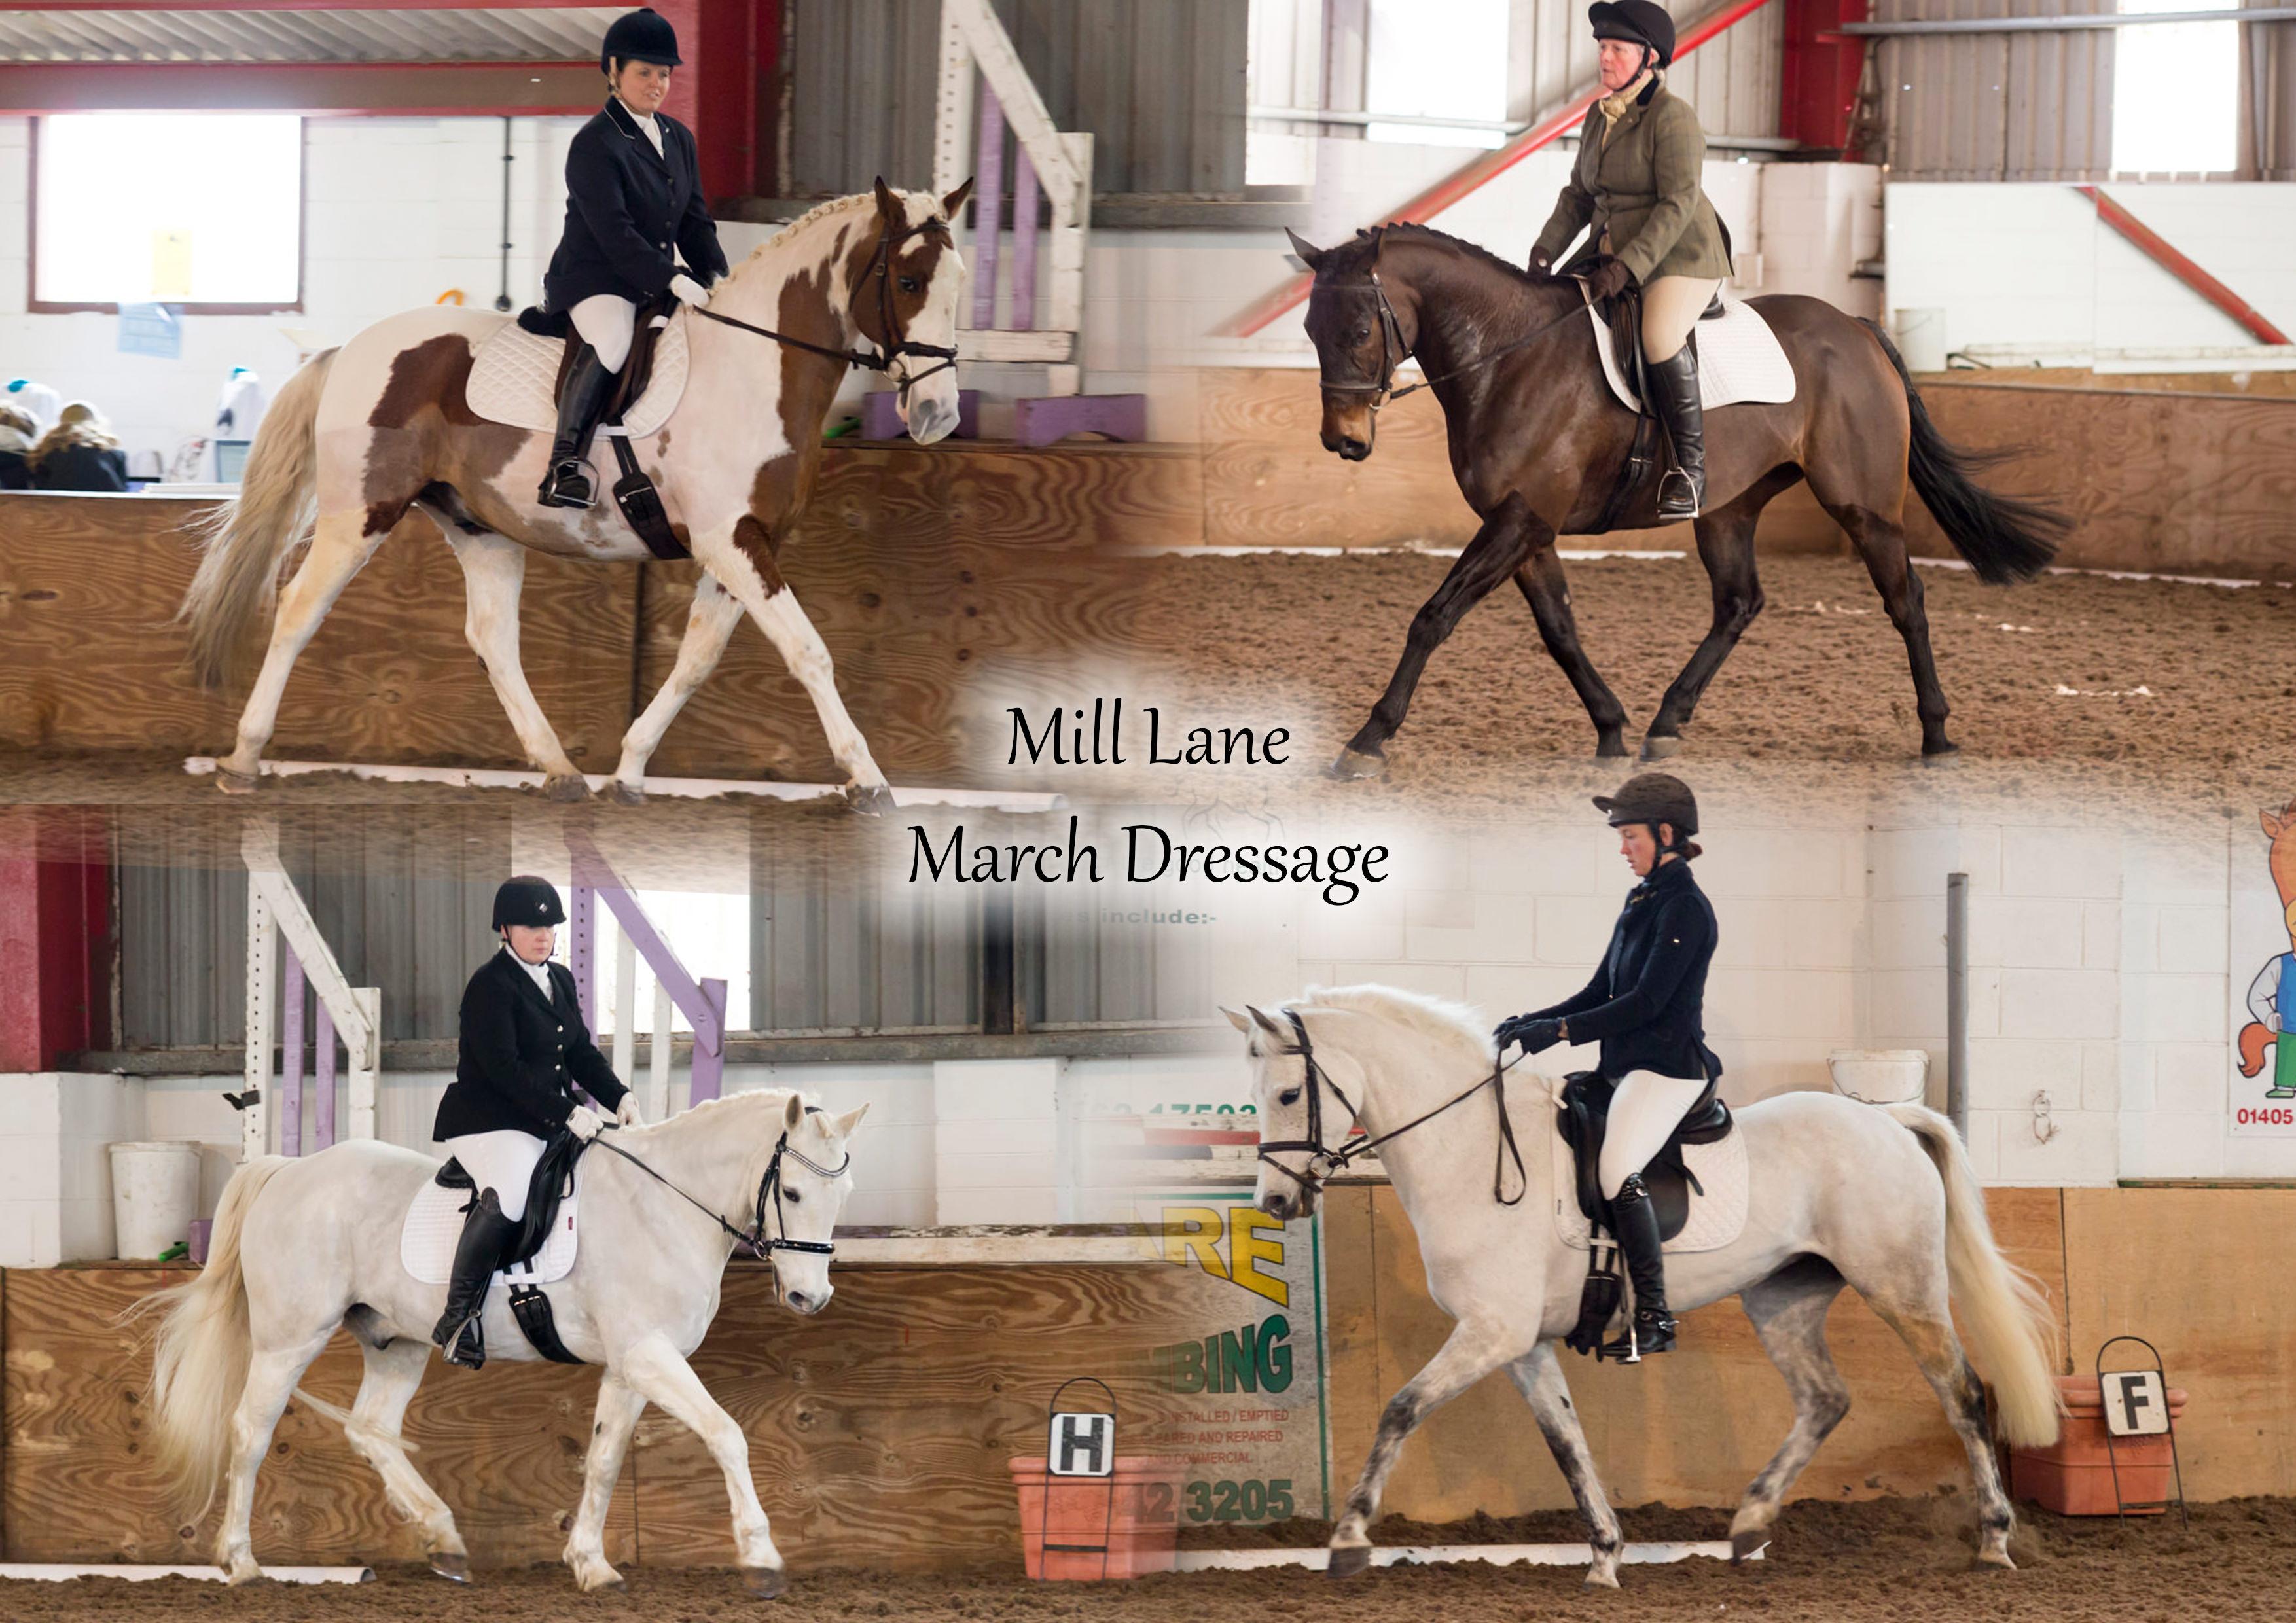 Mill Lane March Dressage